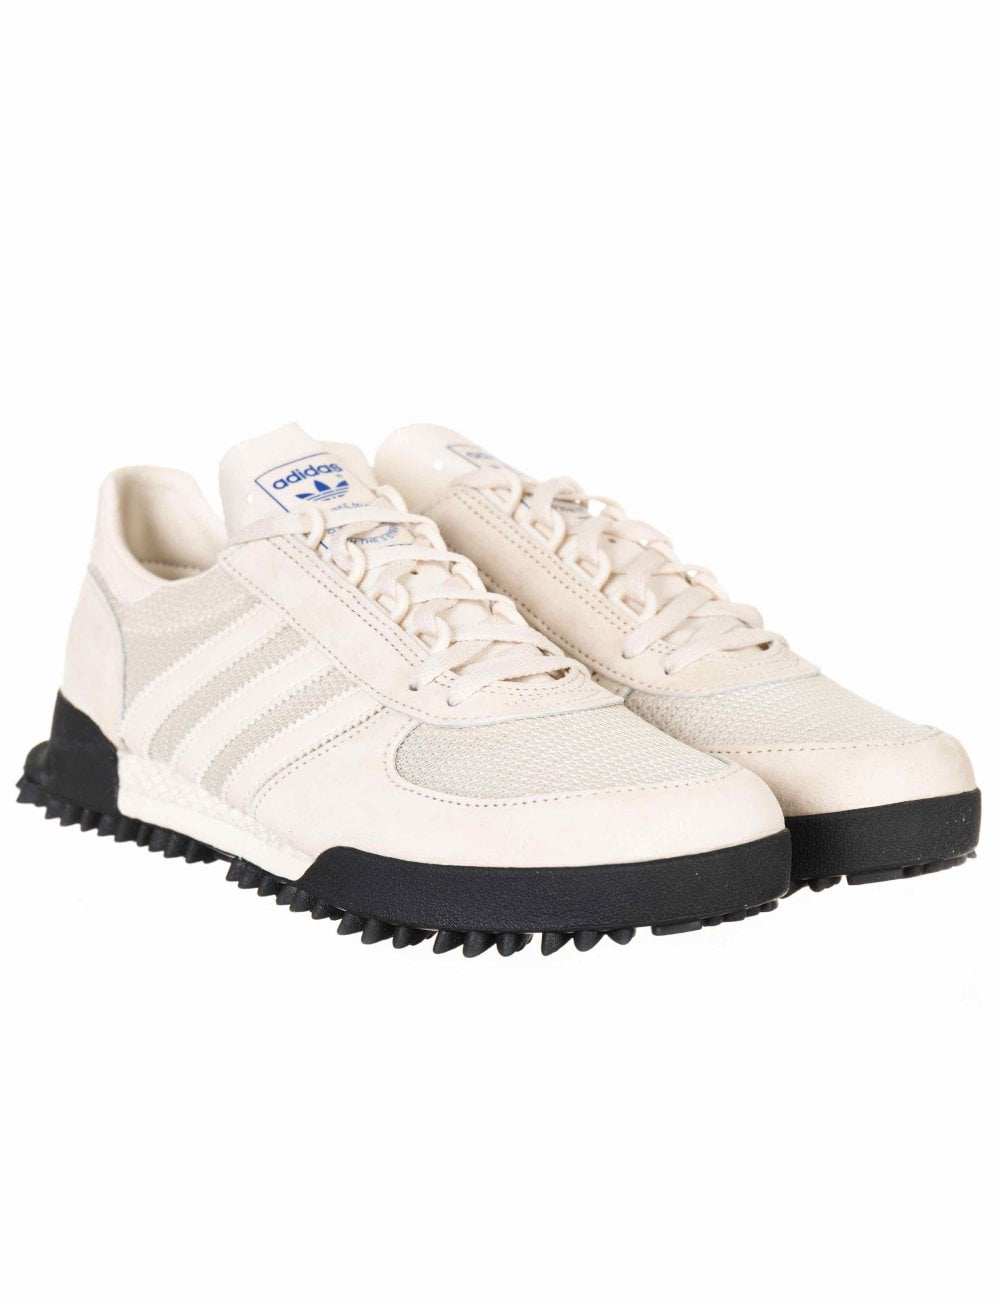 62f7eae5911d4 Adidas Originals Marathon TR Trainers - ChalkWhite Chalk White ...